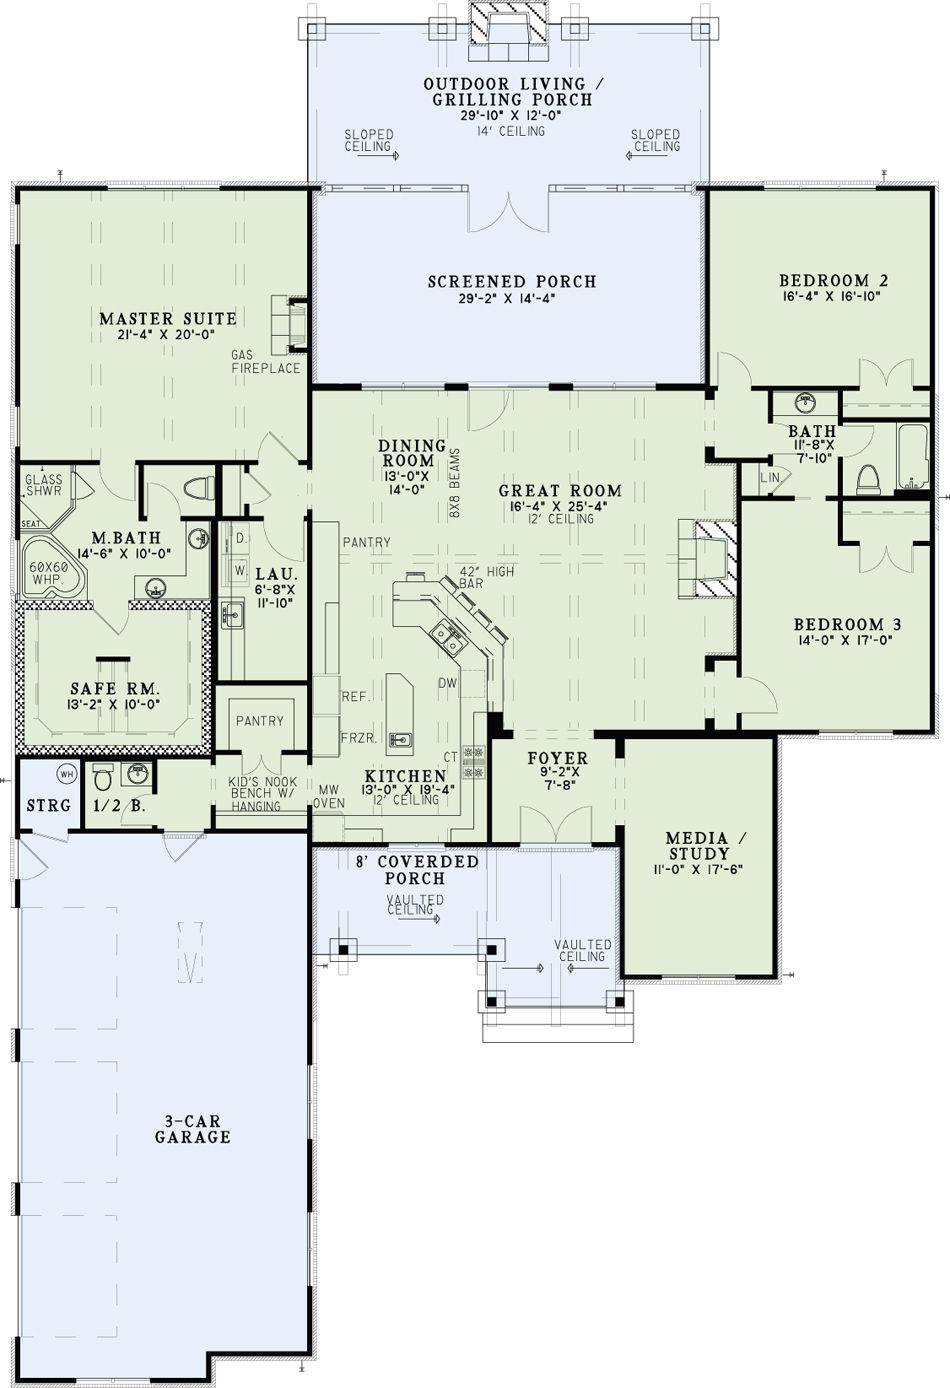 153 2032 floor plan main level my house house plans house rh pinterest com